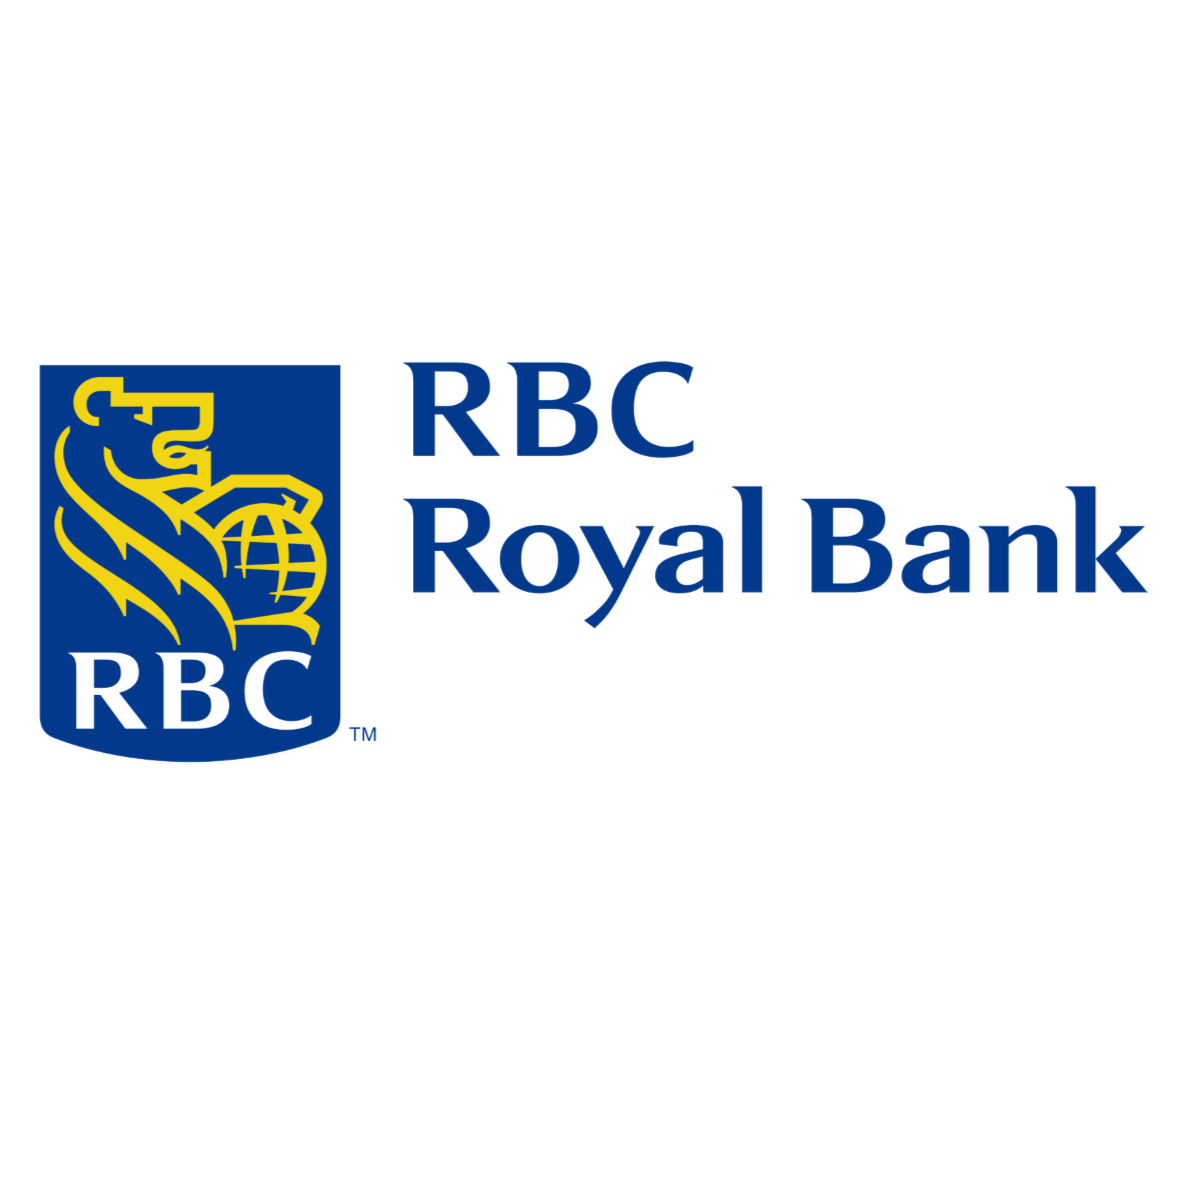 RBC Backs AI-based Climate Change Research